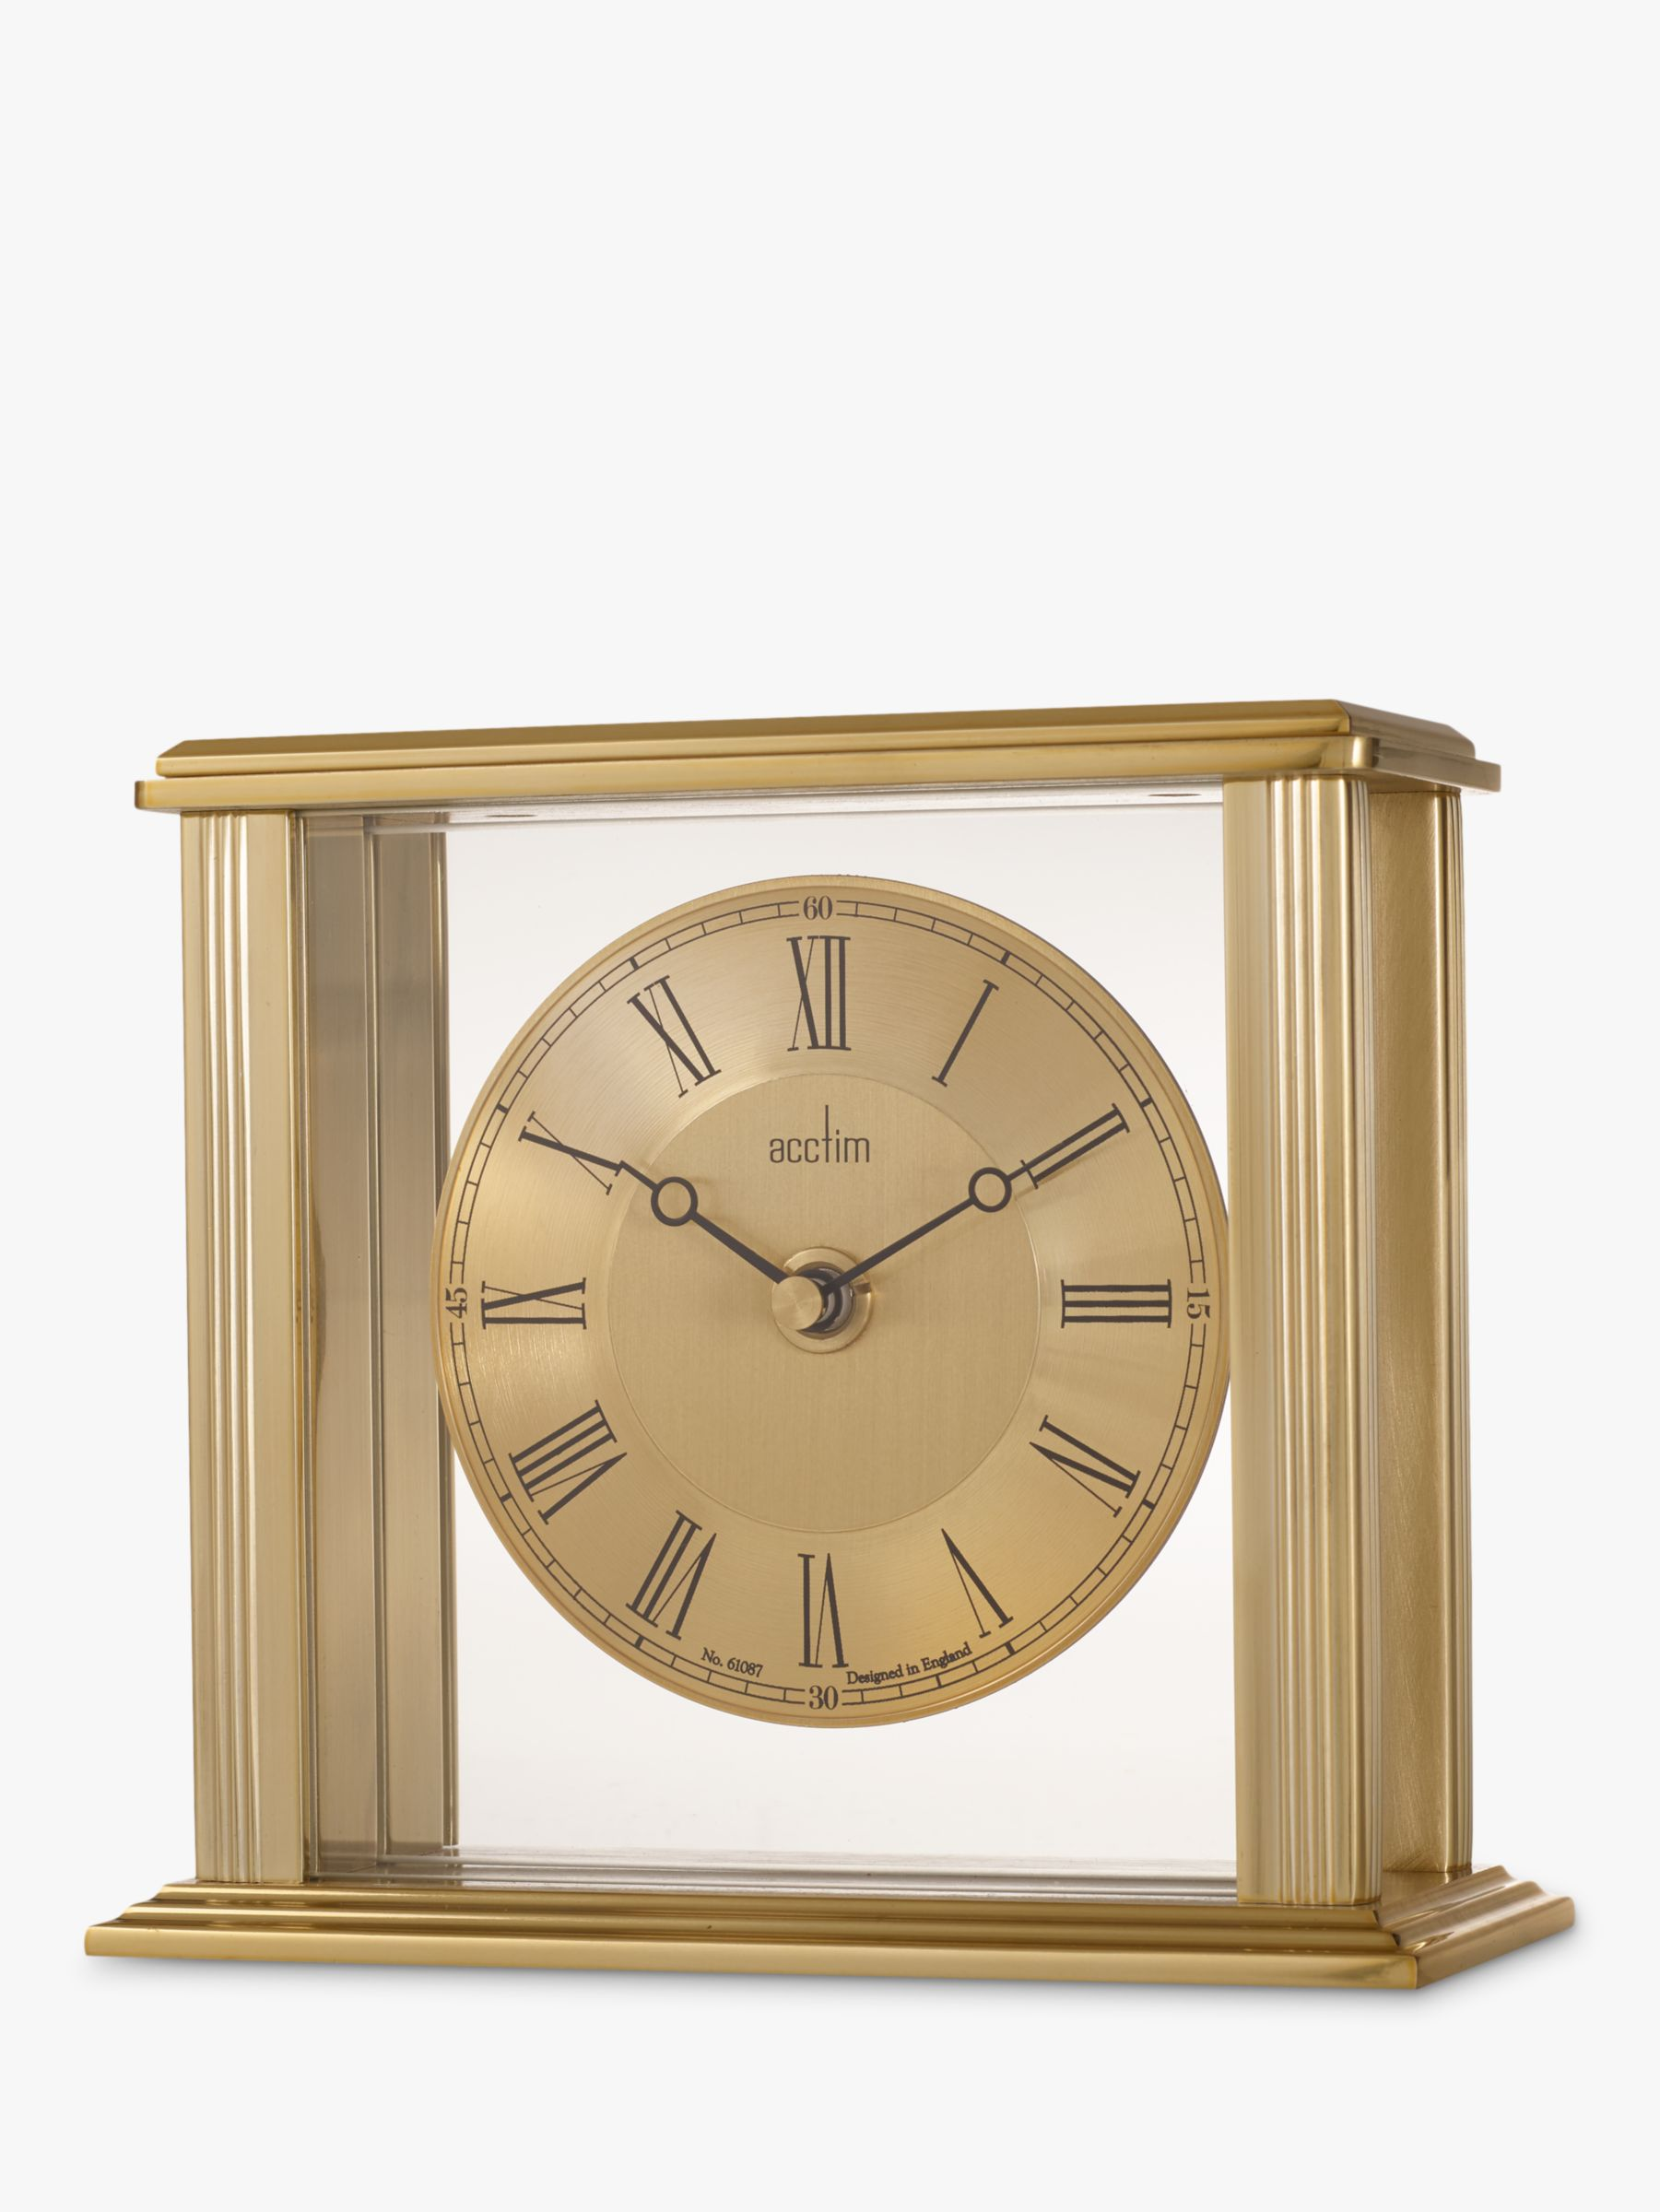 Acctim Acctim Gayhurst Mantel Clock, Gold, H14cm